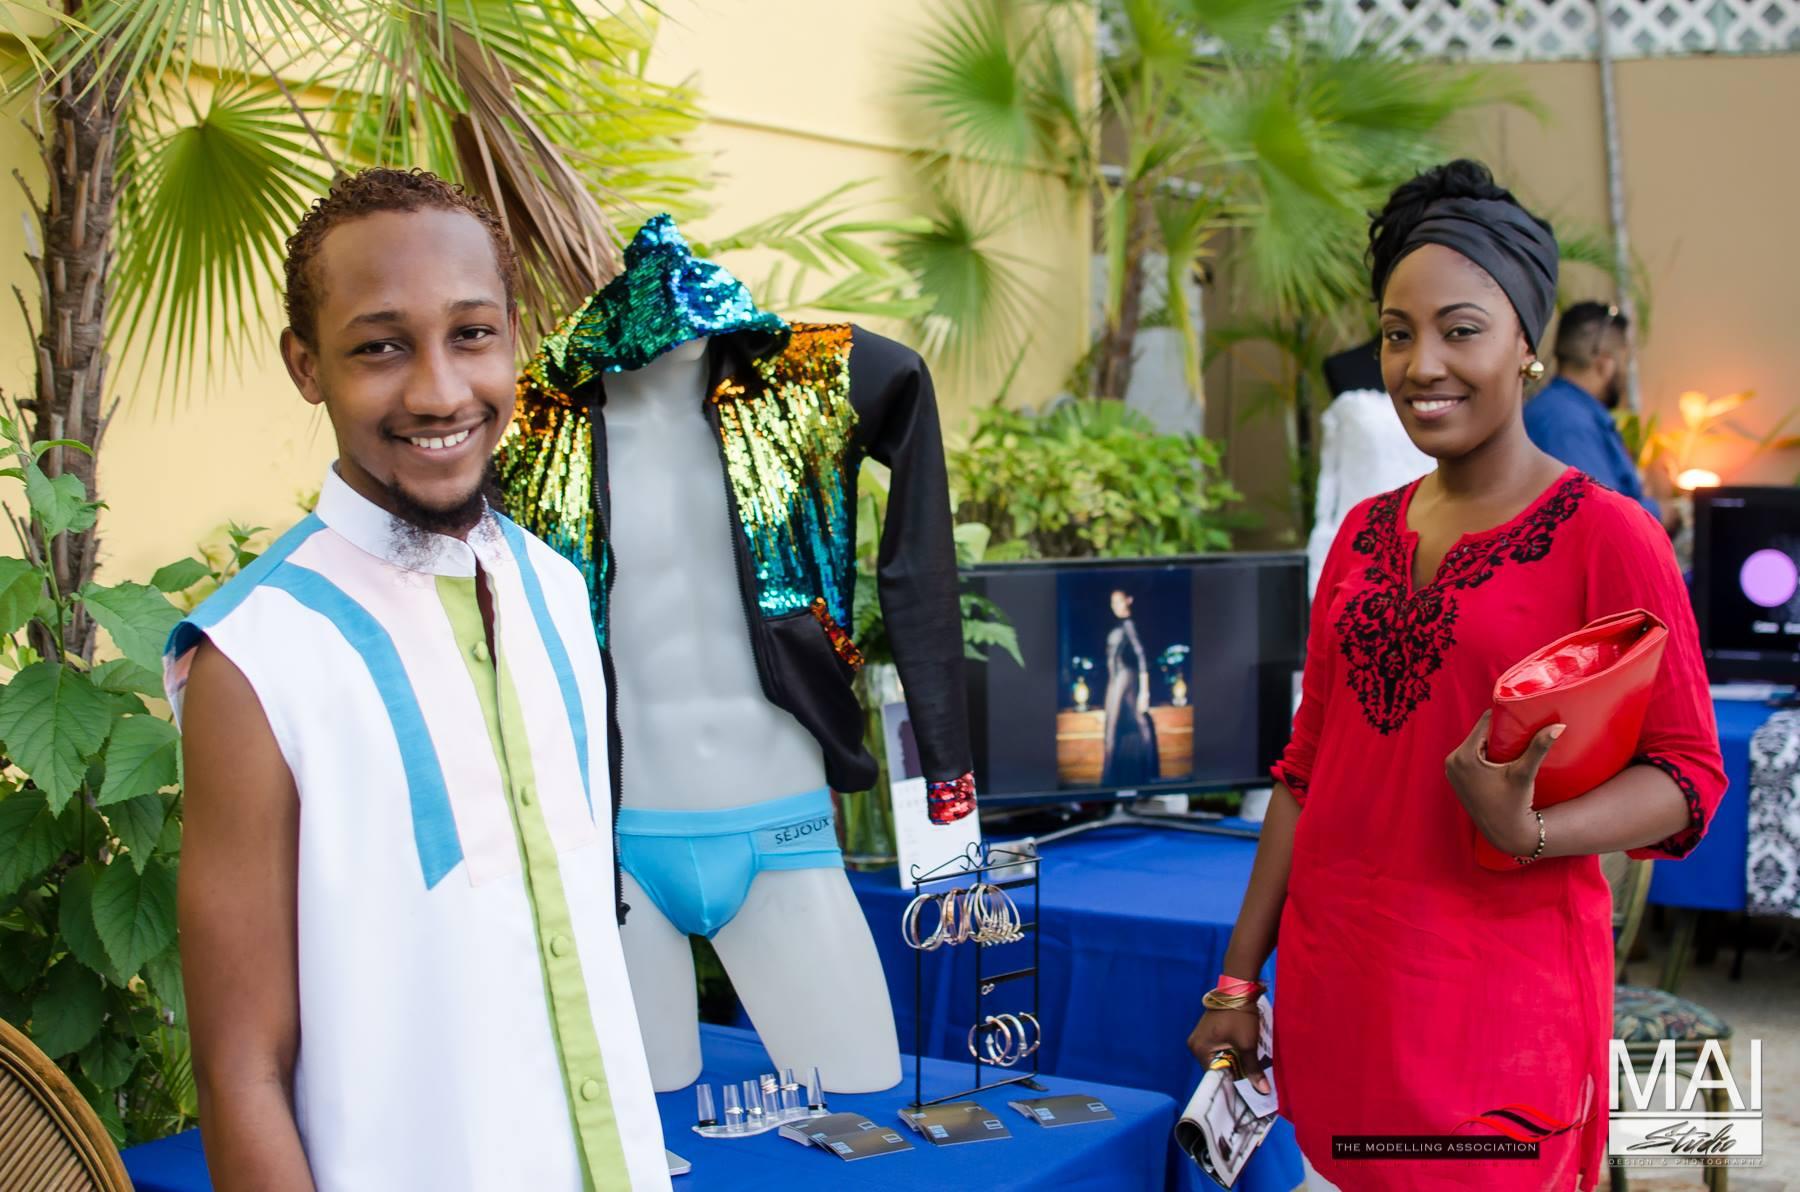 Designer Sejoux showcases his brand at ThriveINTNT 2017